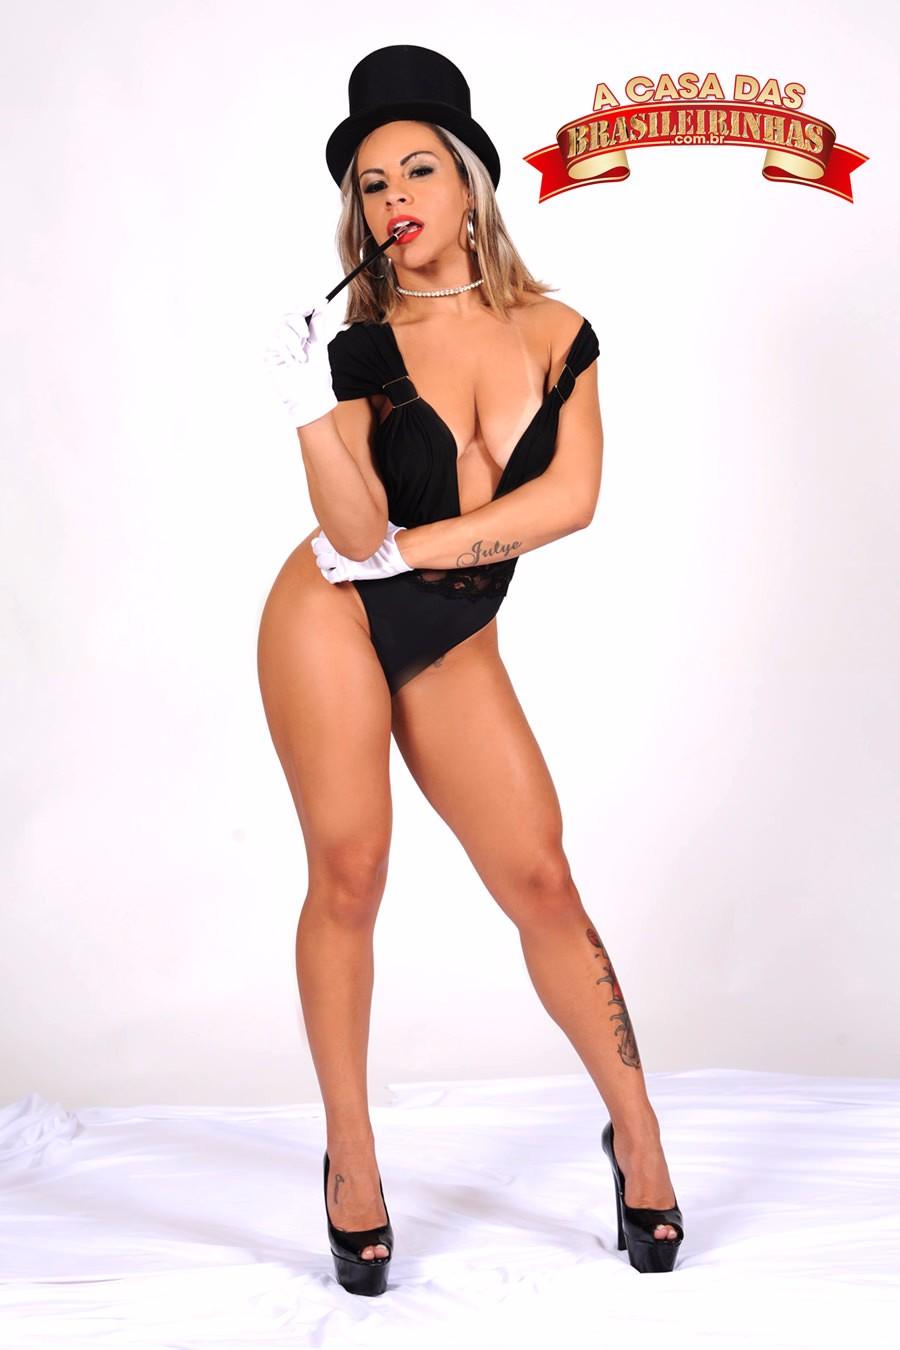 Melissa-Pitanga-de-cartola.jpg